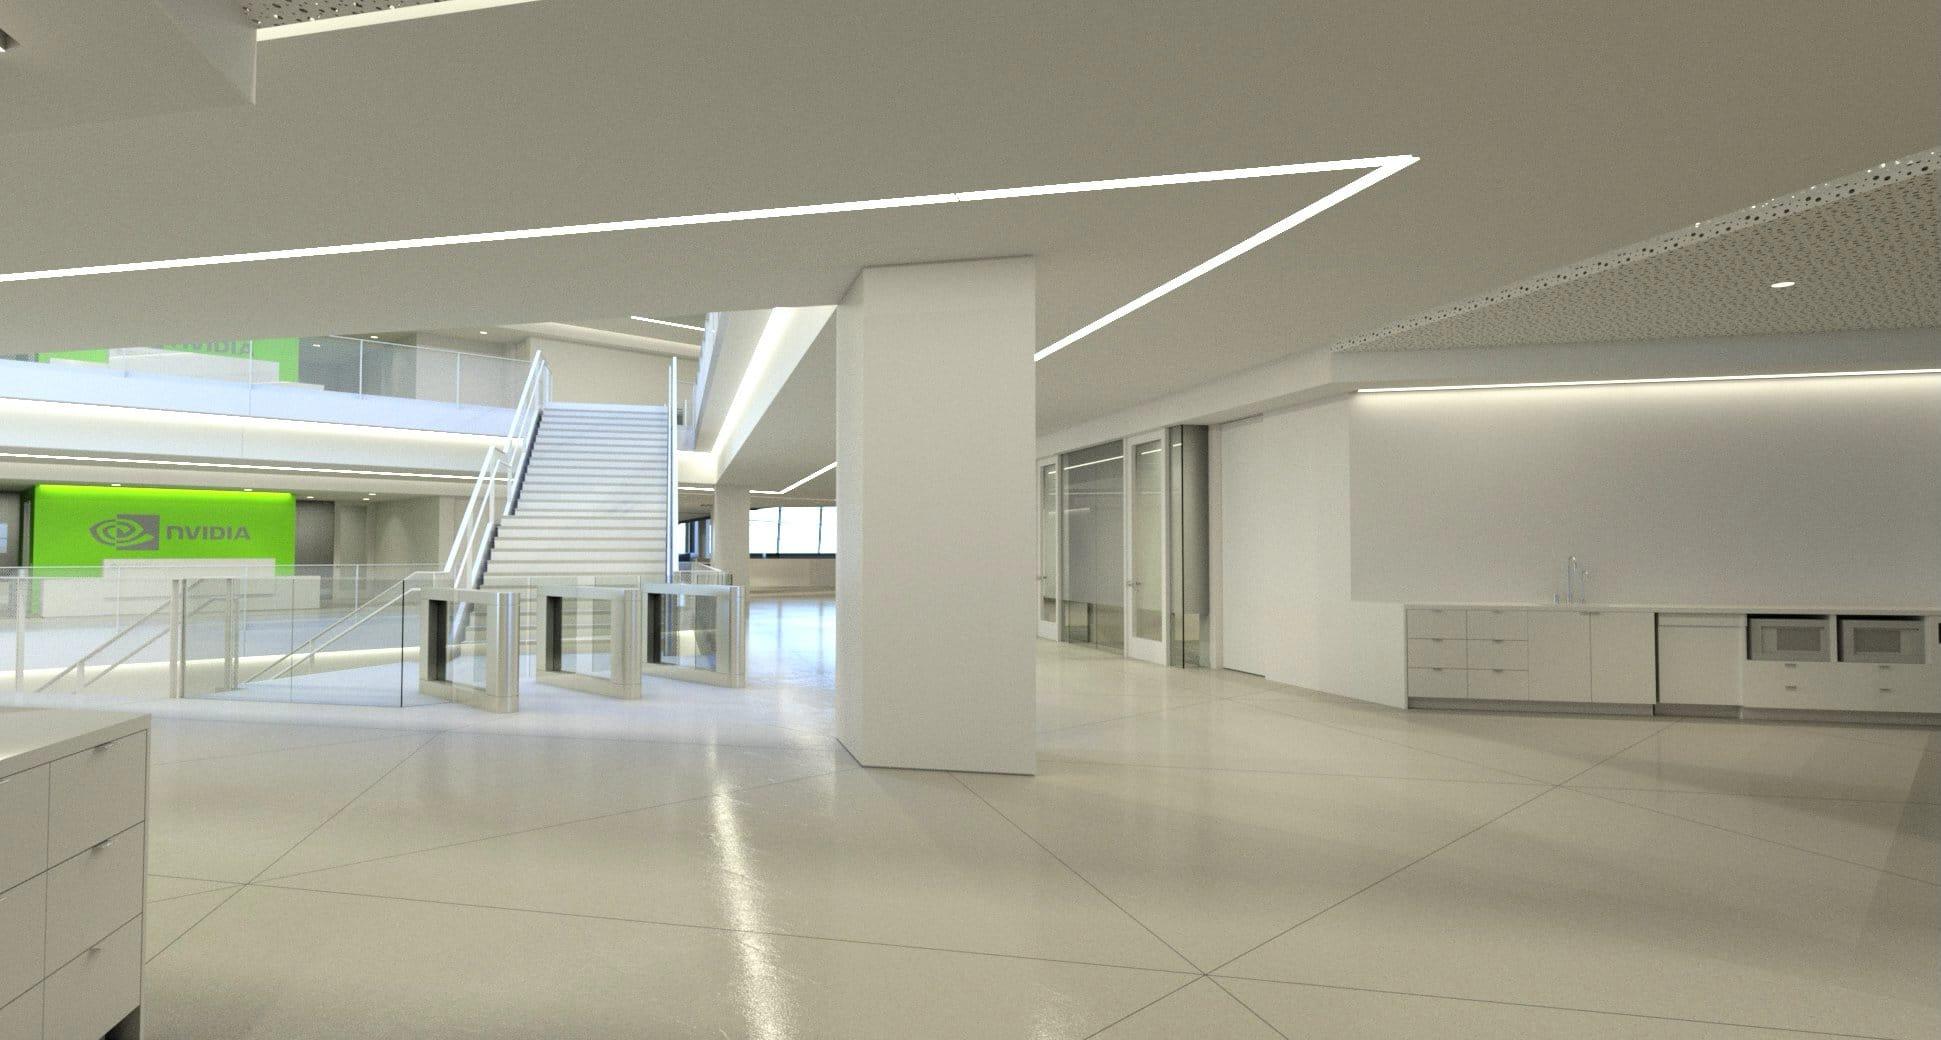 NVIDIA Iray 繪製出 NVIDIA 聖塔克拉拉新建案內部通往夾層的樓梯。